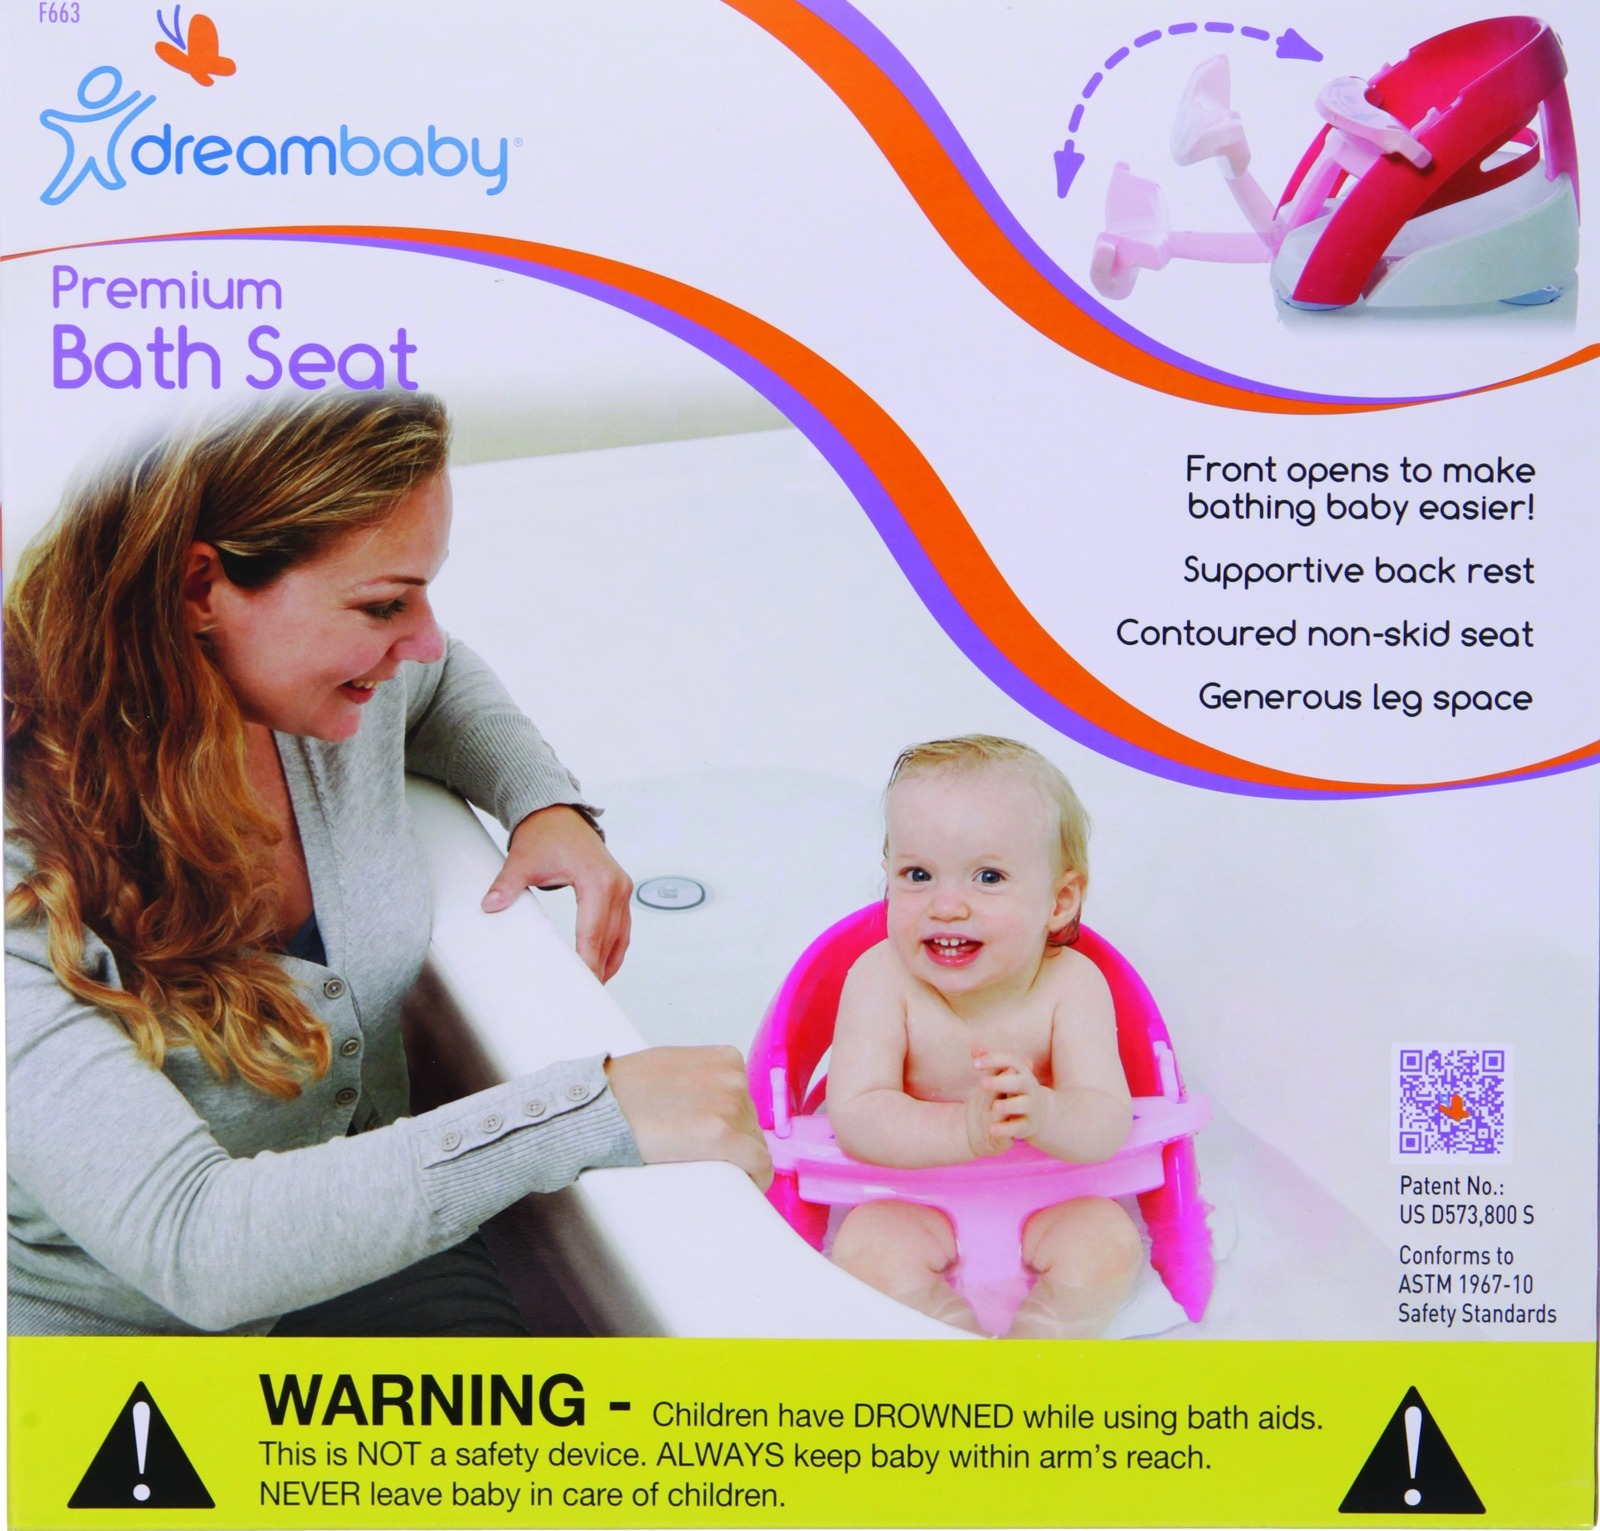 Dreambaby Deluxe Bath Seat image